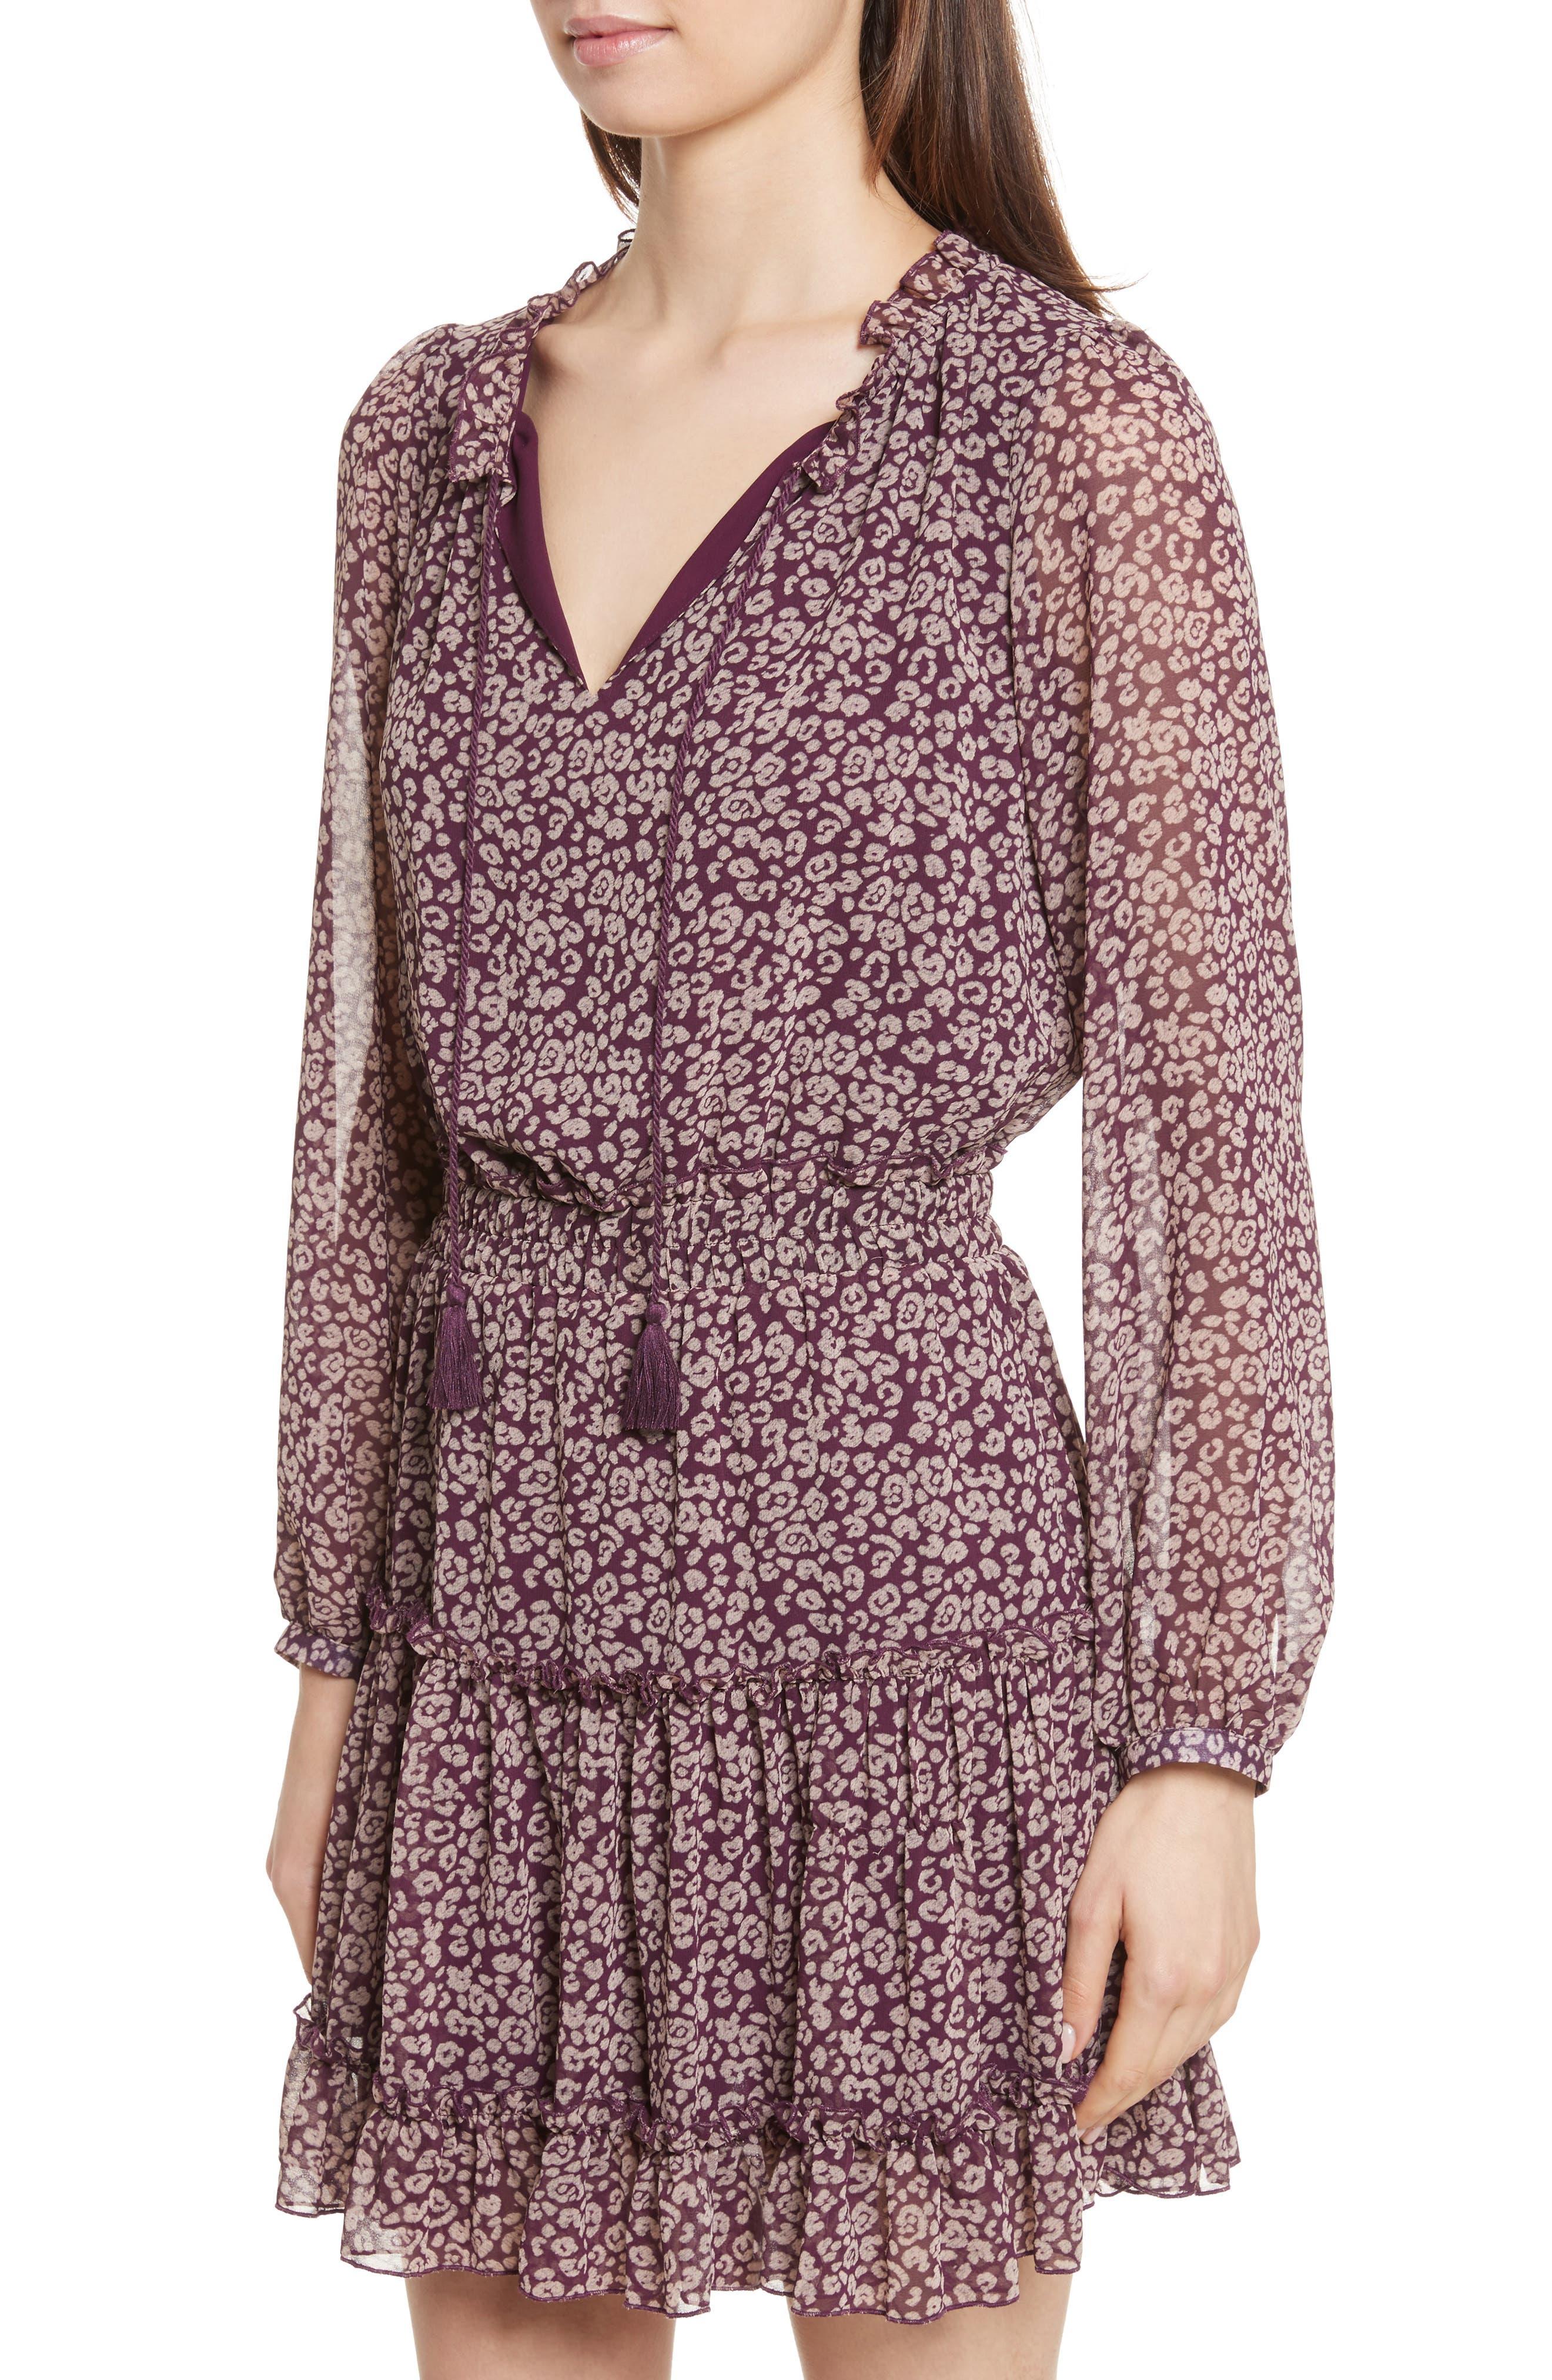 Rosemary A-Line Dress,                             Alternate thumbnail 4, color,                             531